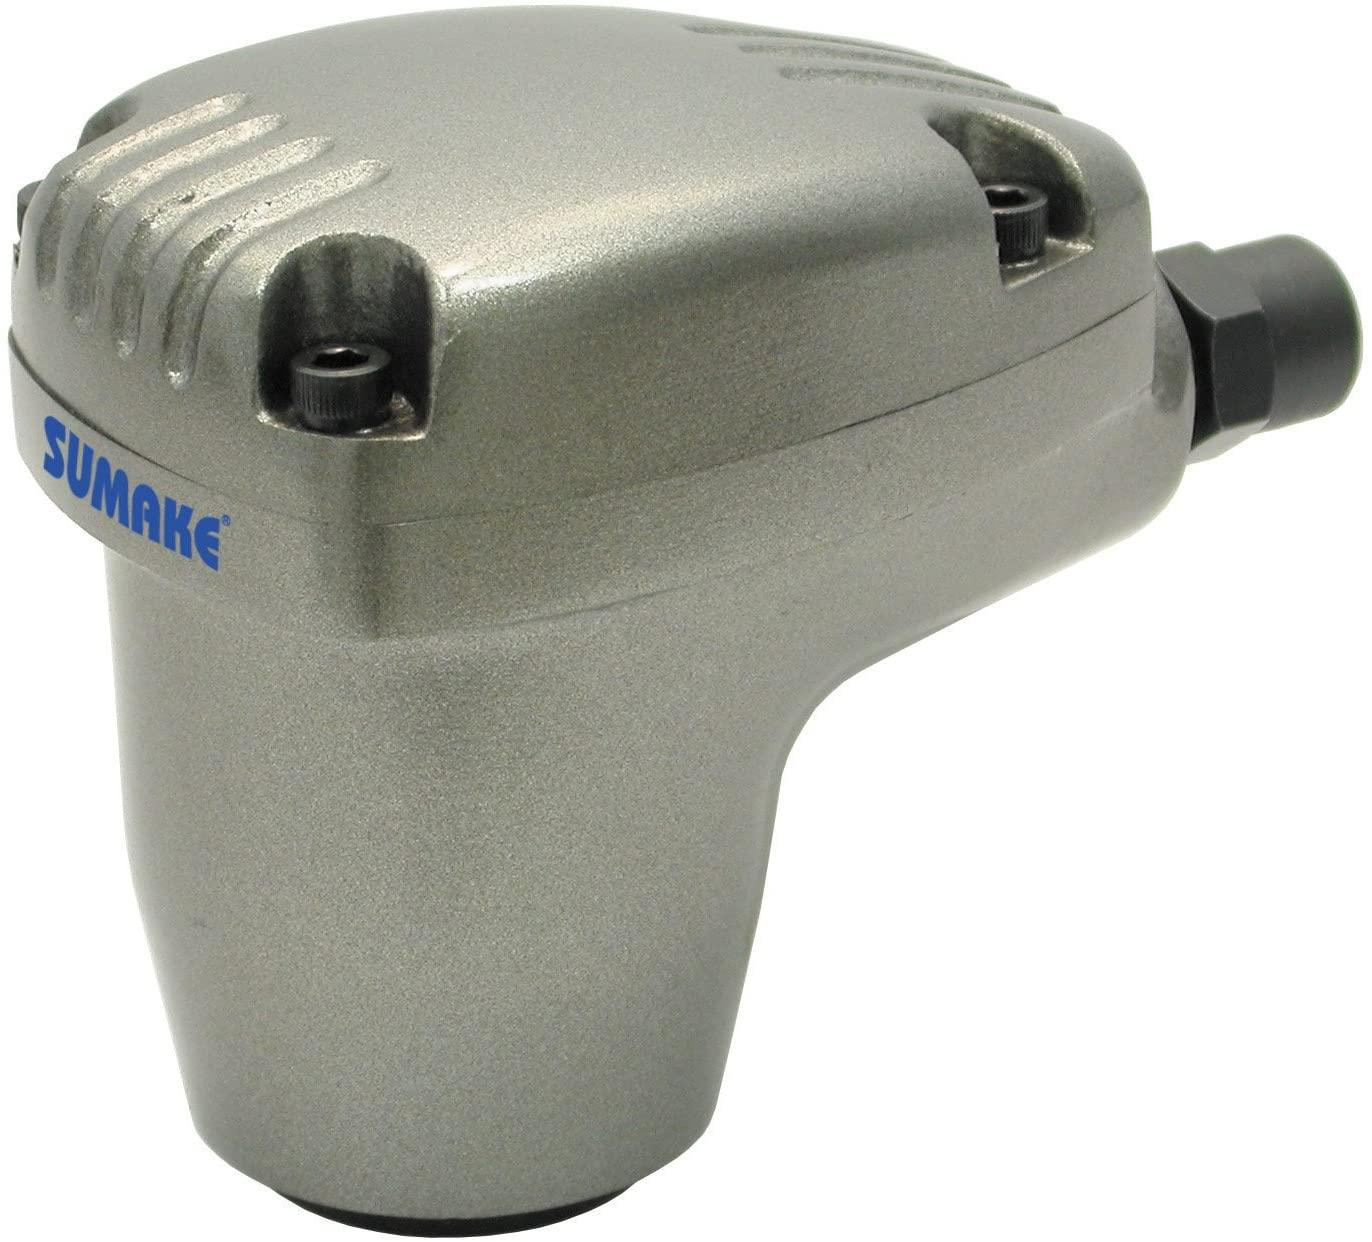 Air Pneumatic Automatic Palm Hammer, 1000 Stroke per Min (BPM), (Sumake ProLine ST-3310)